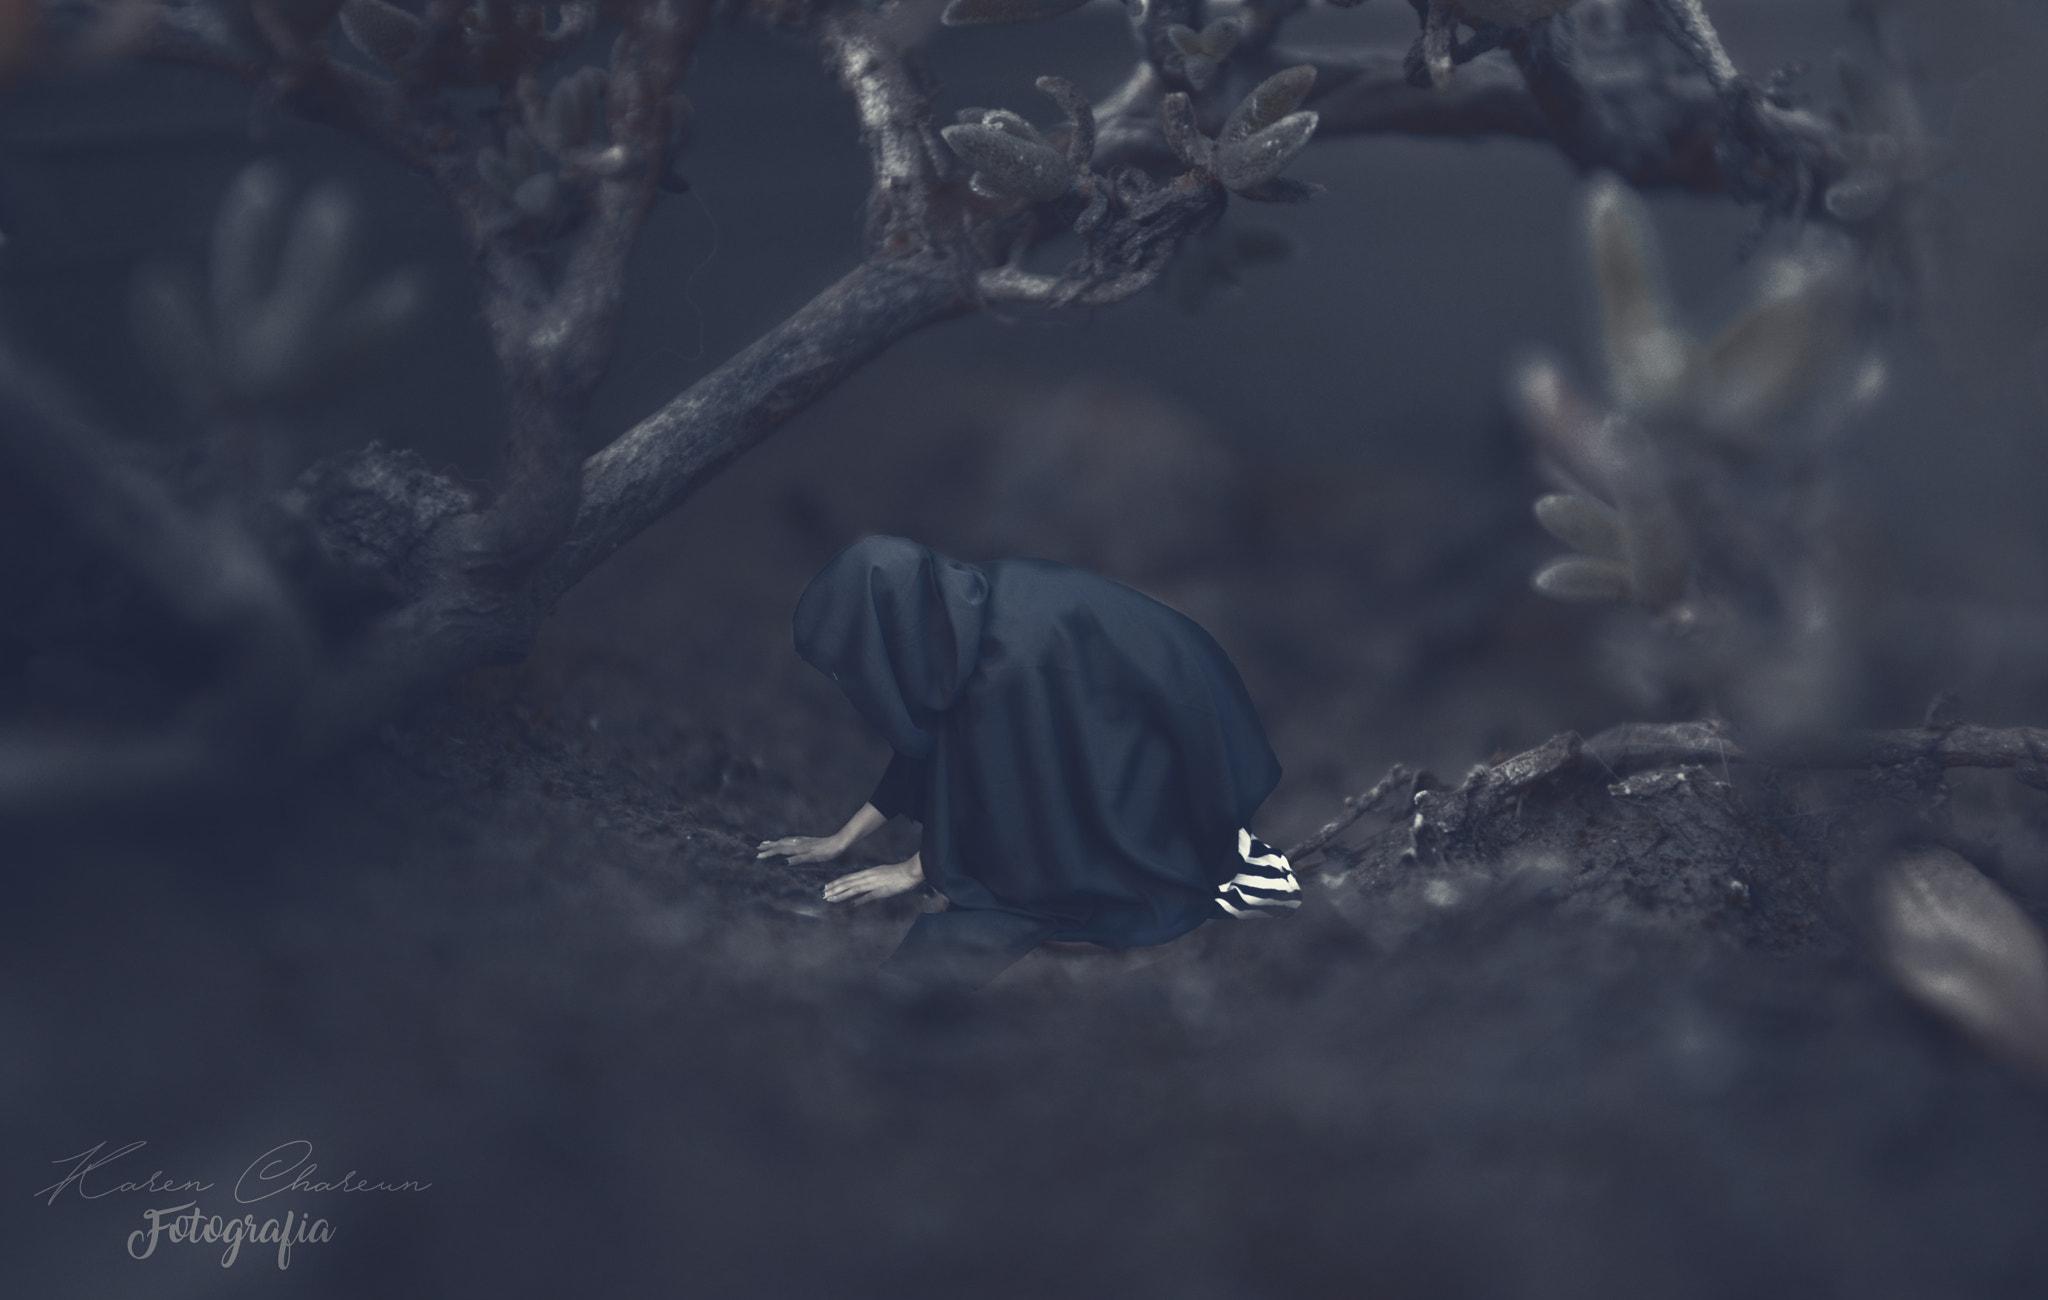 La pena de la muerte // The Pain of Death